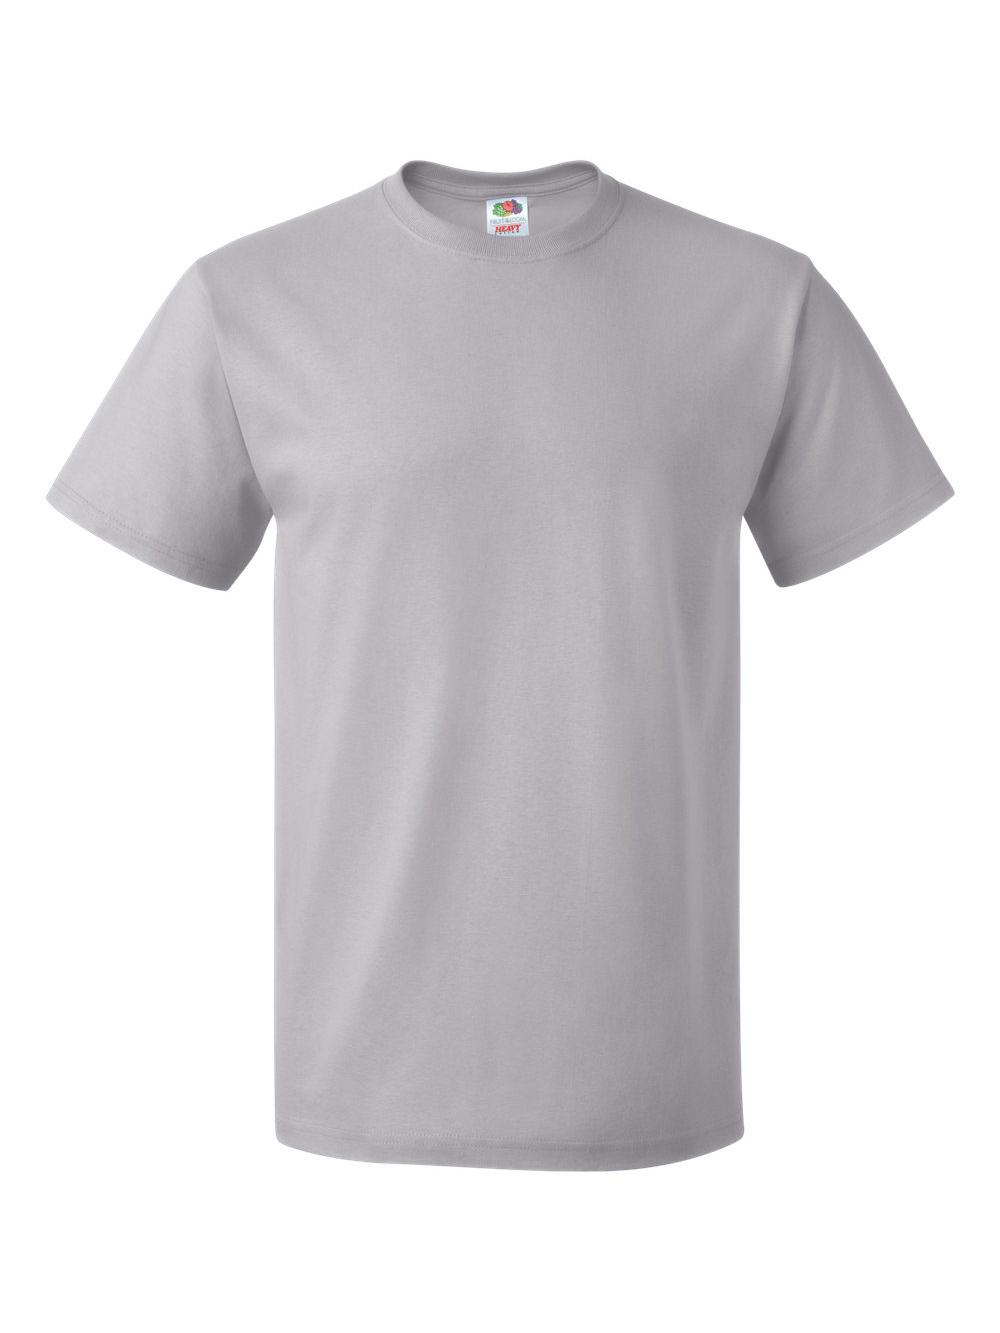 Fruit-of-the-Loom-HD-Cotton-Short-Sleeve-T-Shirt-3930R thumbnail 126